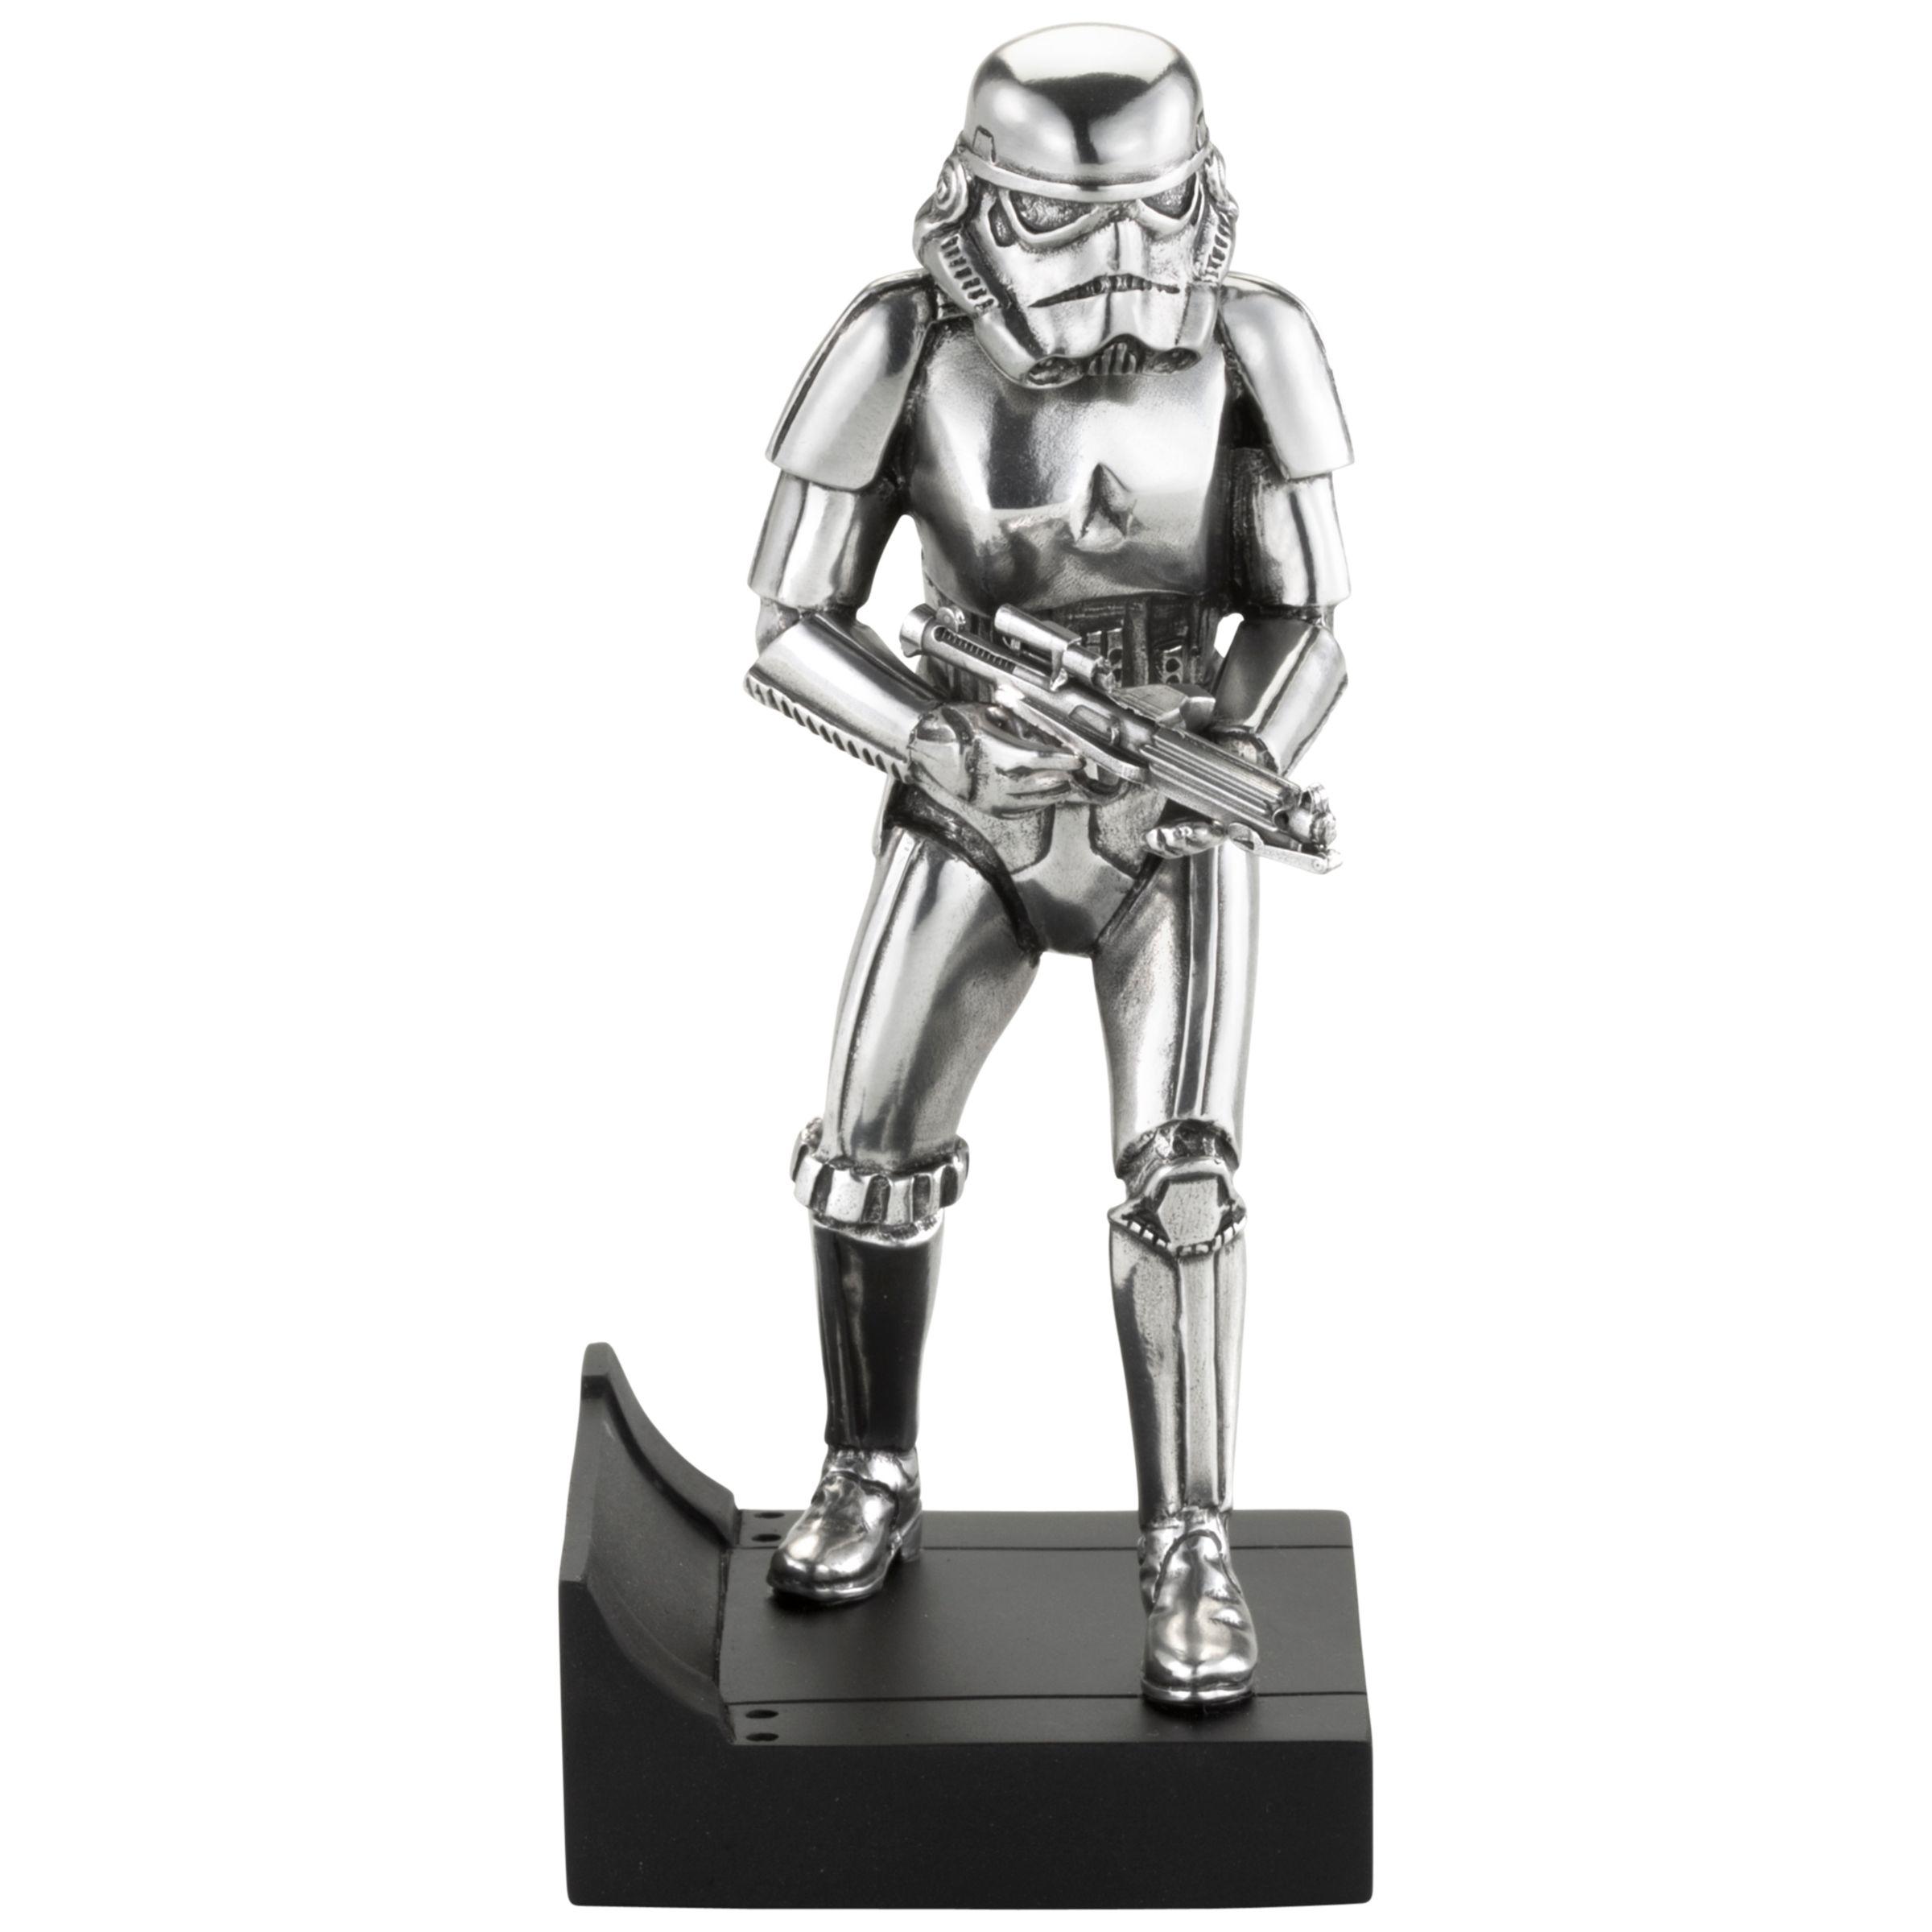 Royal Selangor Royal Selangor Star Wars Stormtrooper Figurine